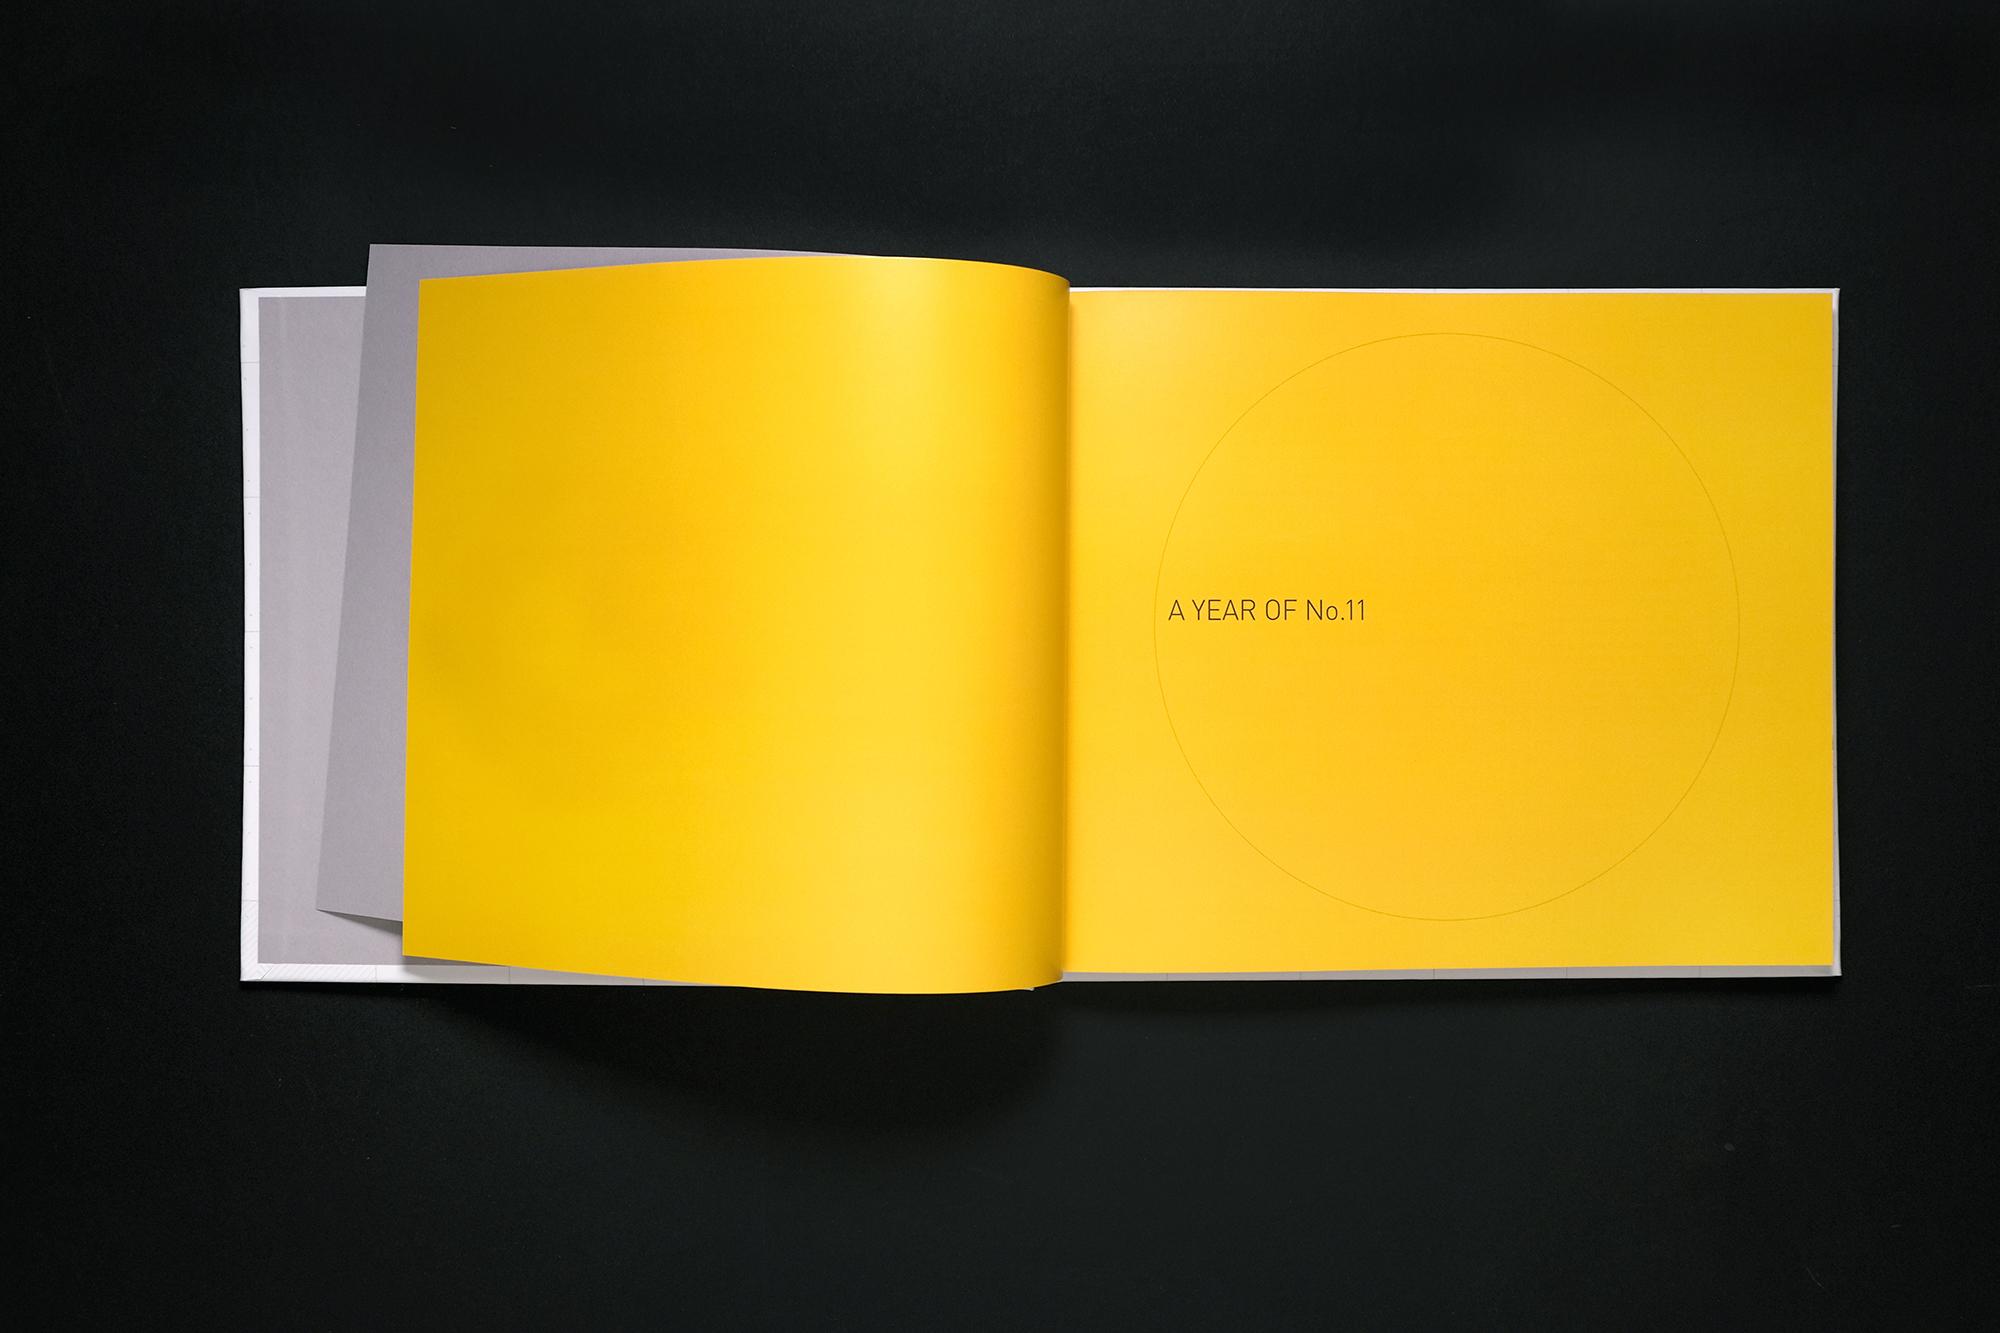 https://rusyndesign.co.uk/wp-content/uploads/2020/04/UWR-19-book-shots-03.jpg